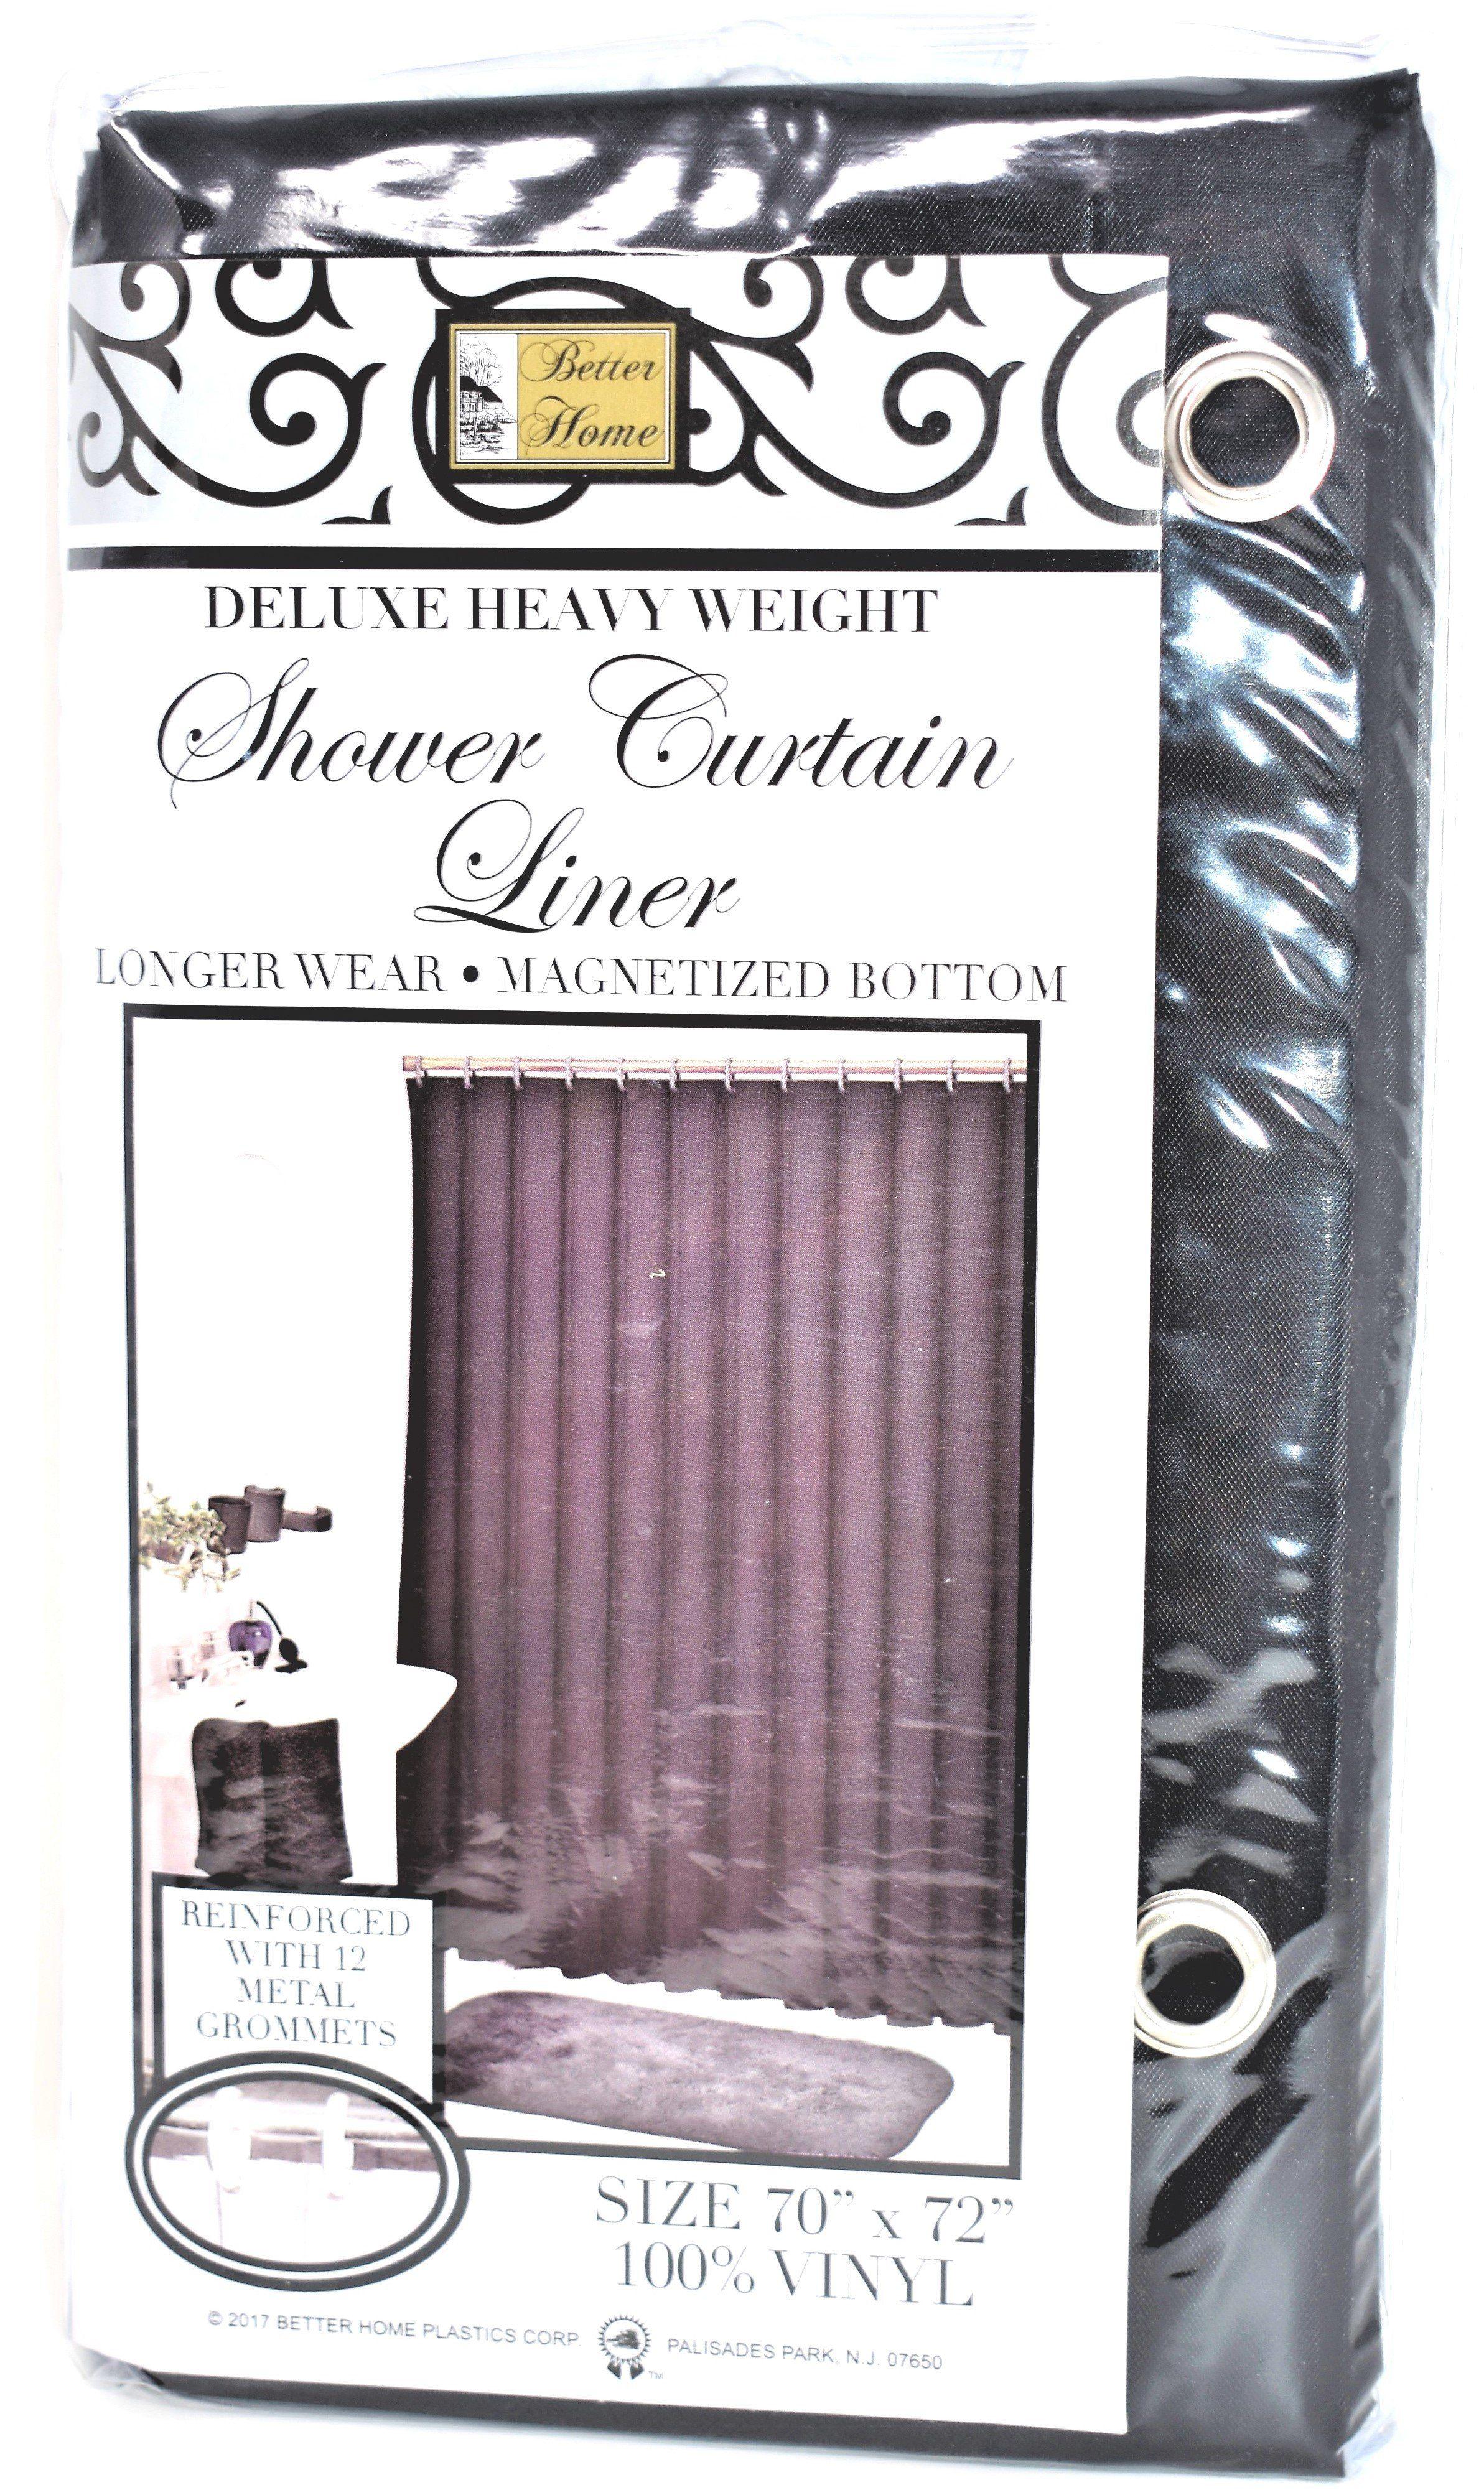 Deluxe Heavy Weight 100 Vinyl Shower Curtain Liner 70 X 72 Black Color Vinyl Shower Curtains Curtains Shower